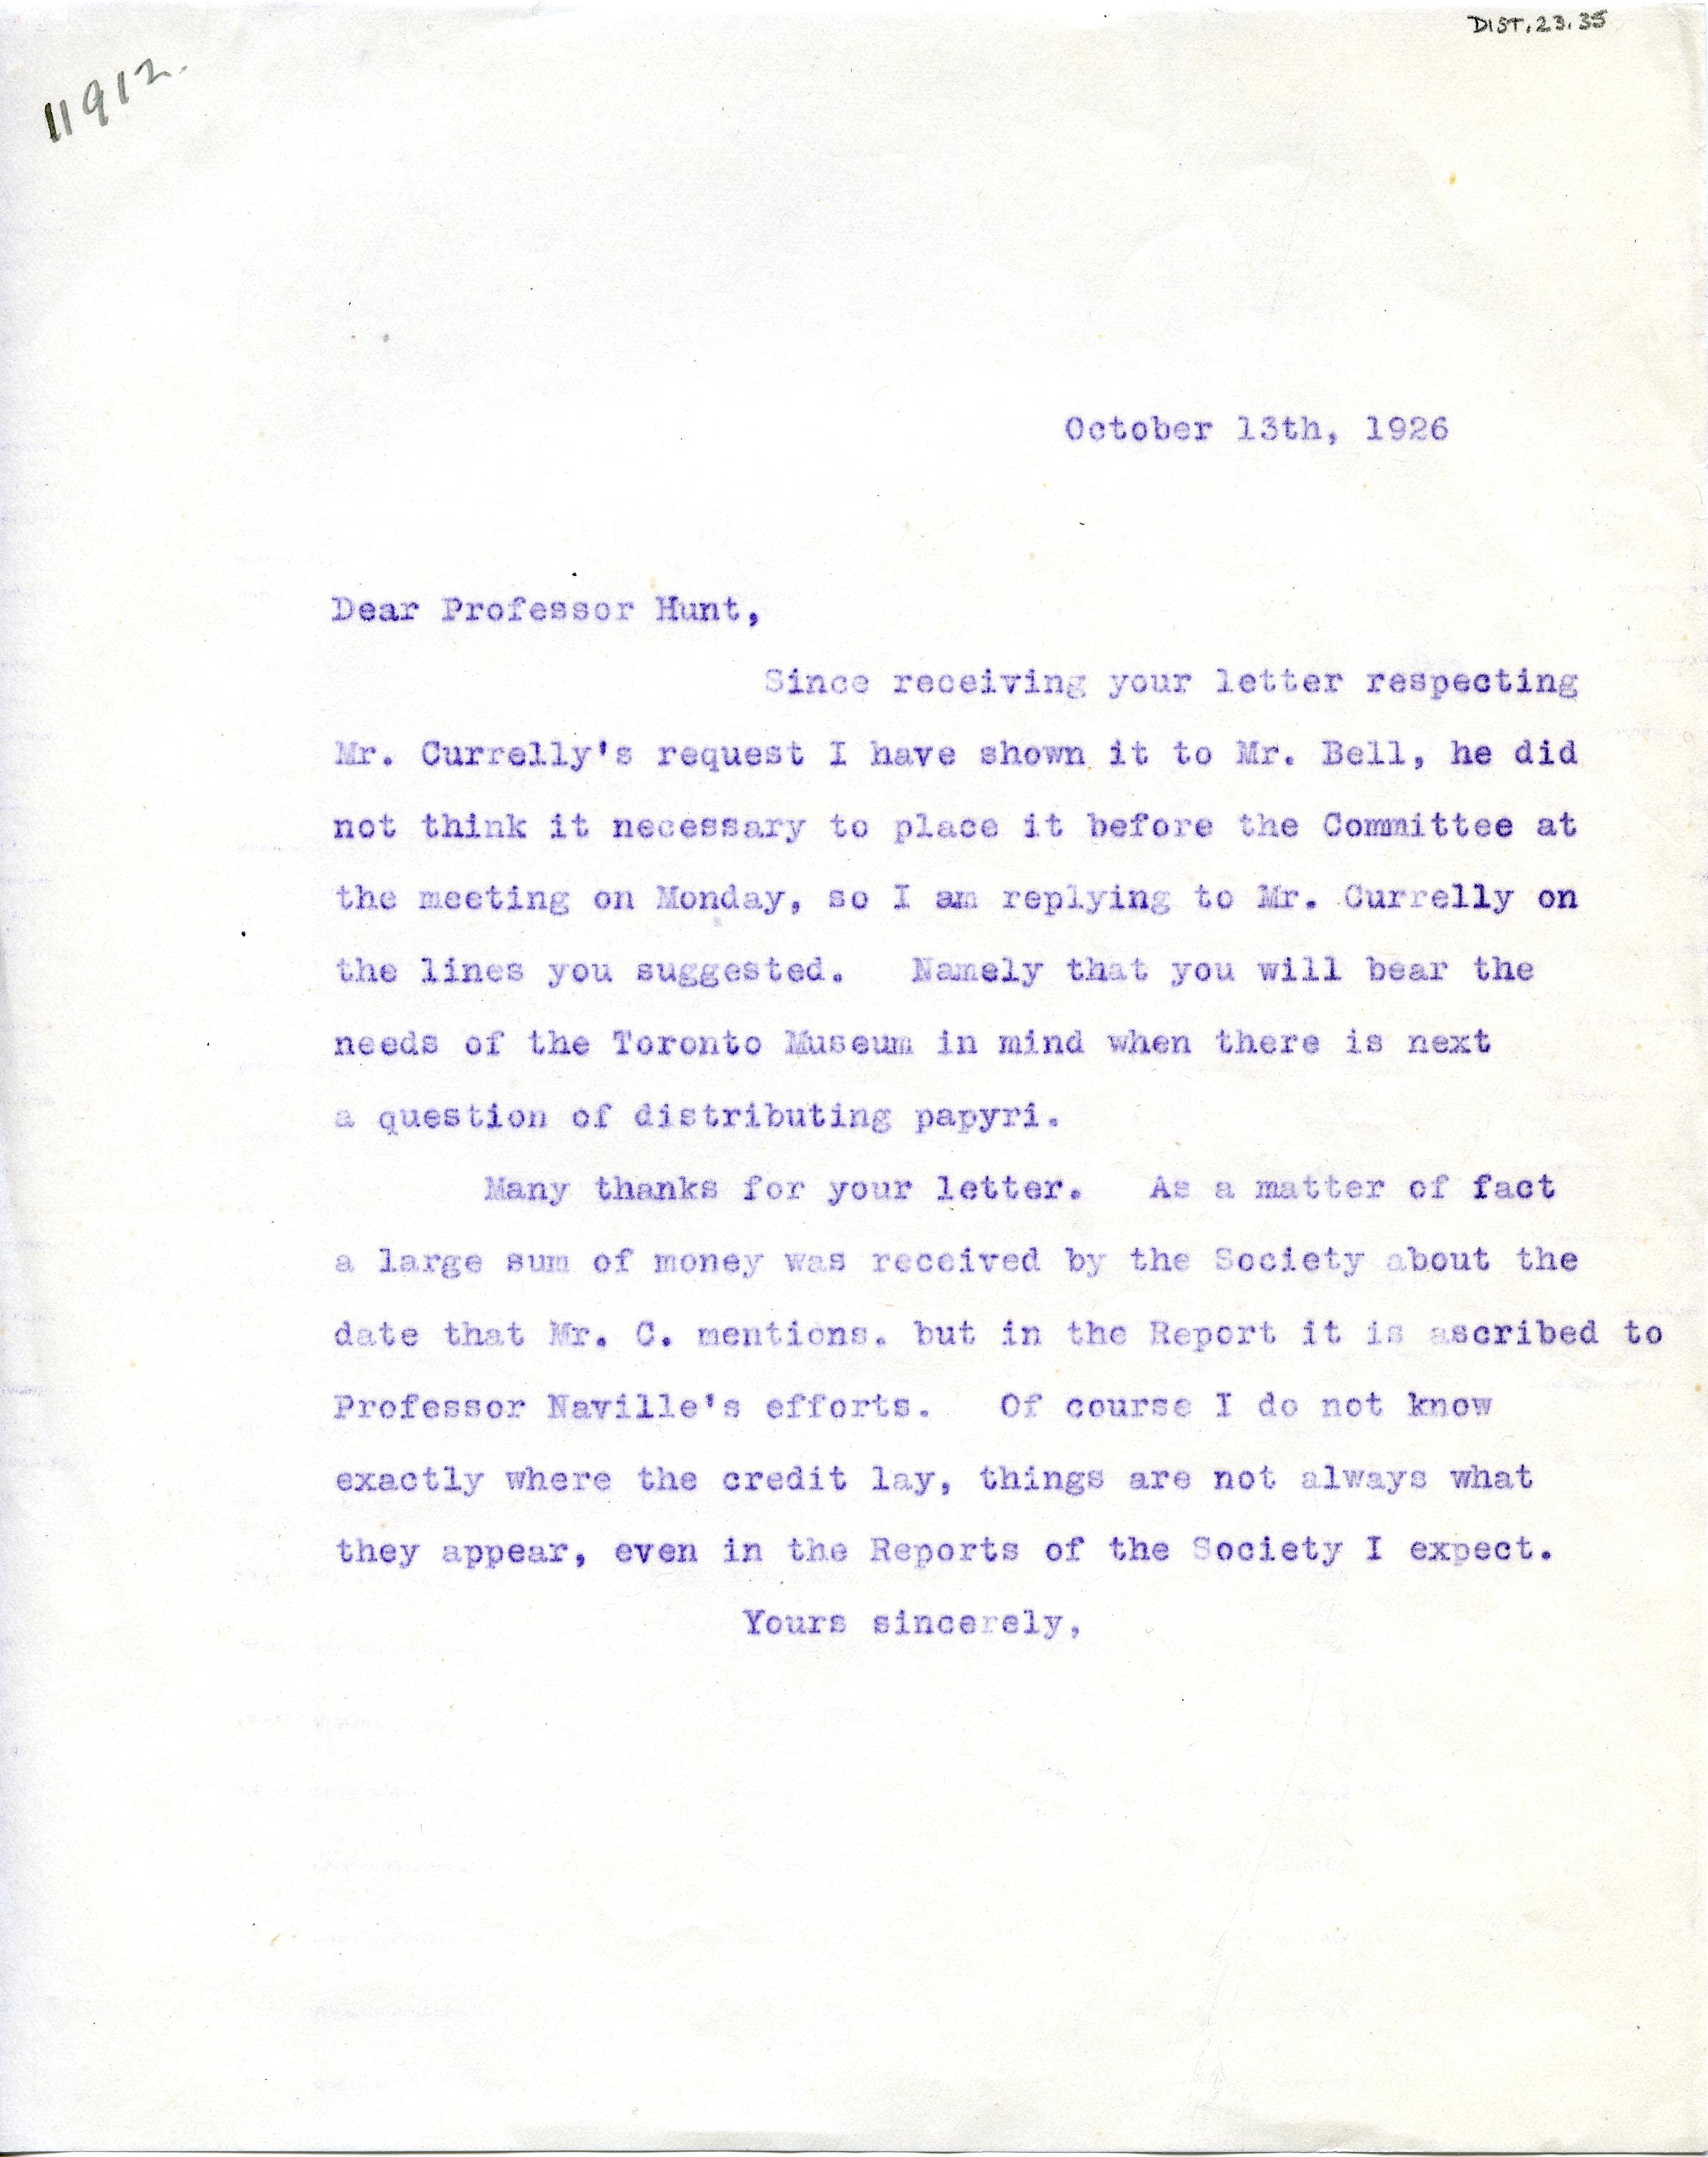 1904-05 Sinai, Deir el-Bahri, Oxyrhynchus, Naukratis DIST.23.35